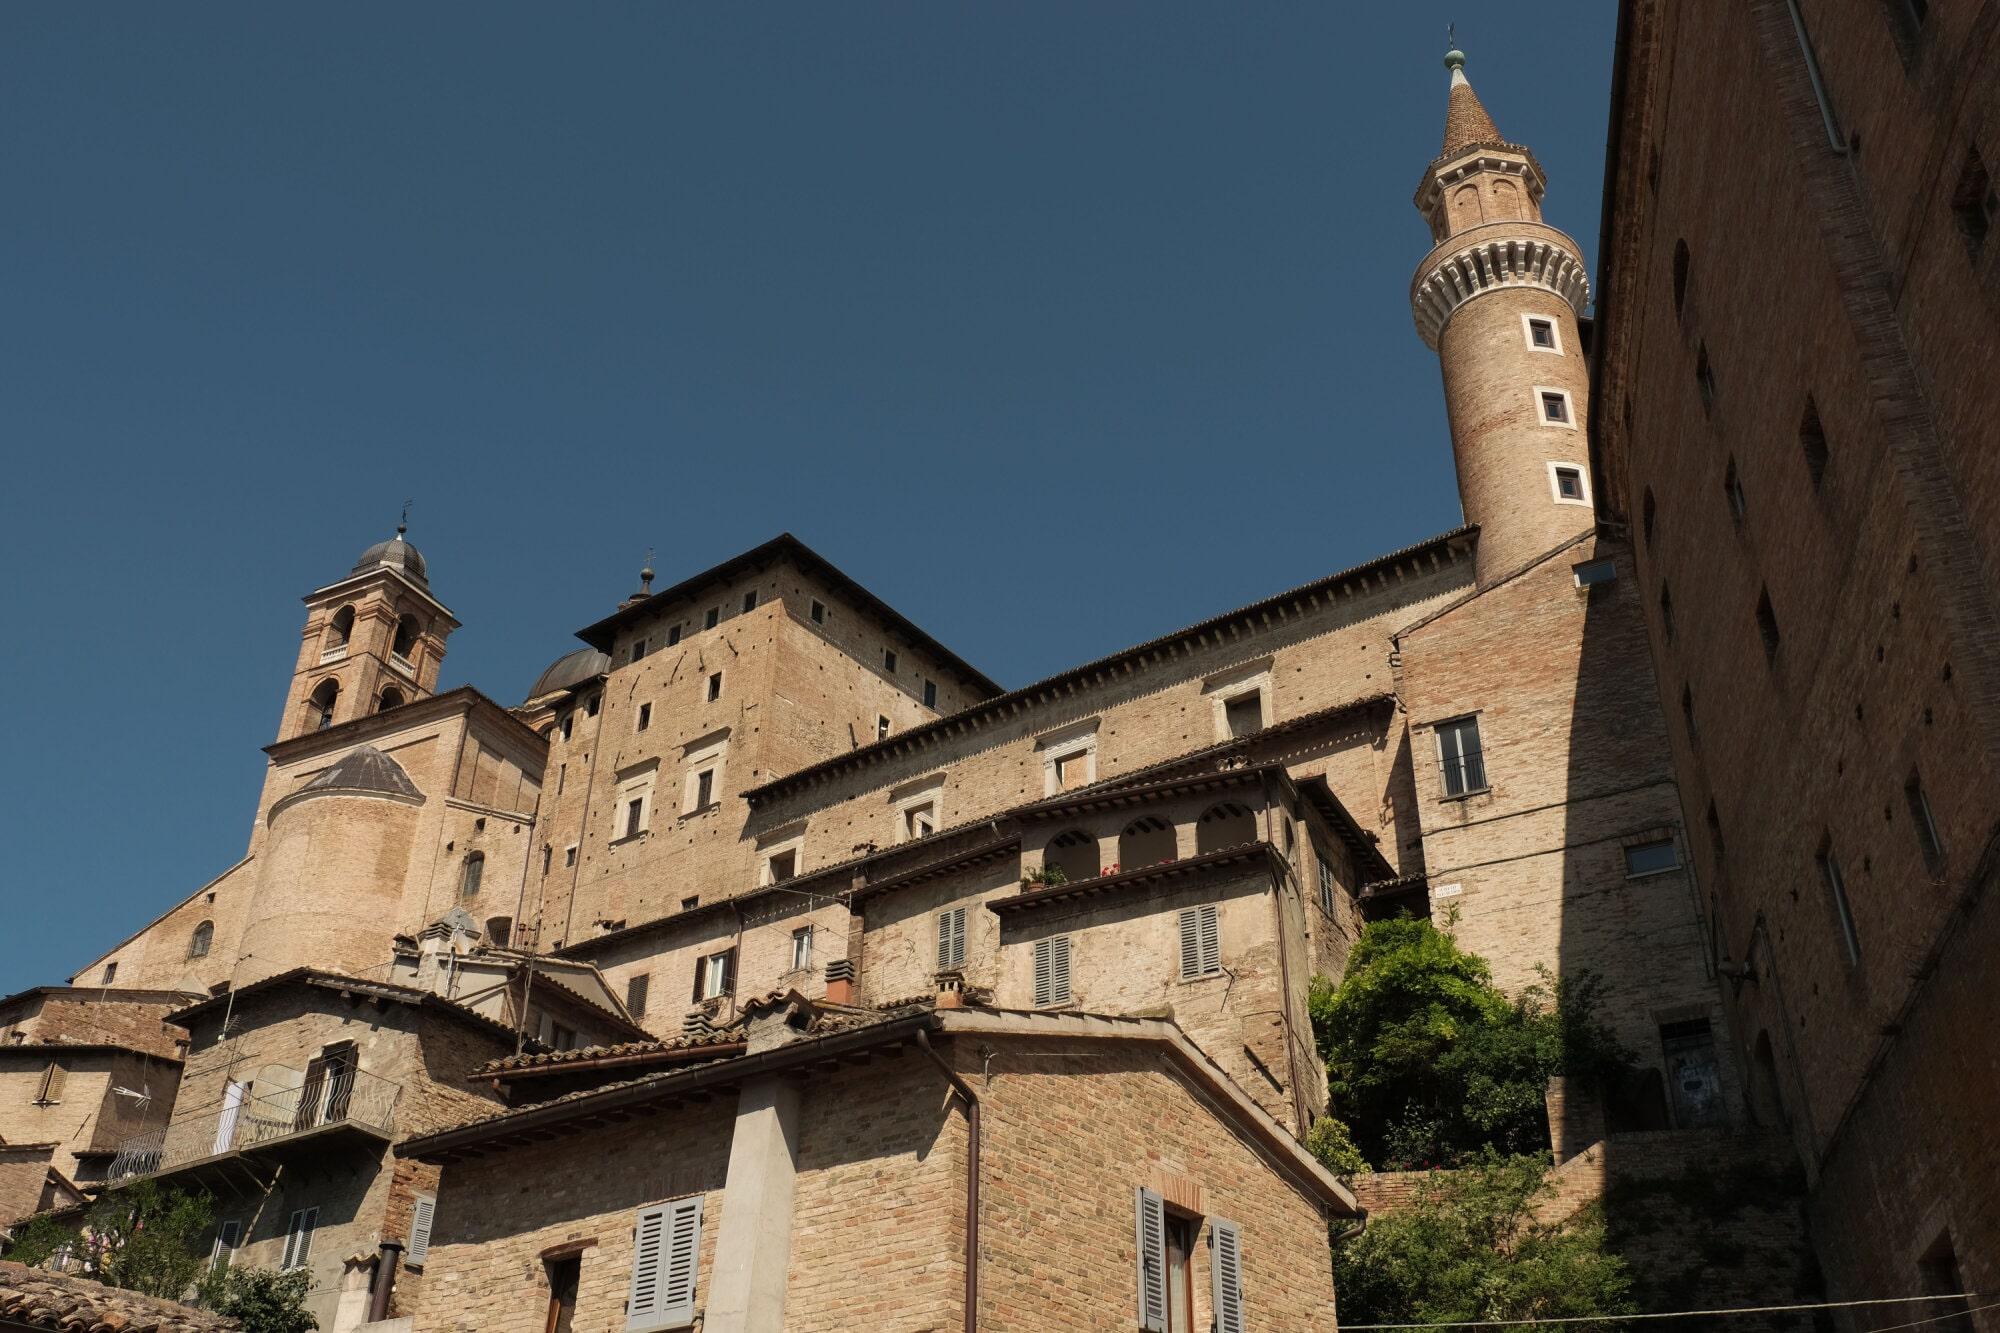 Urbino - Palazzo Ducale